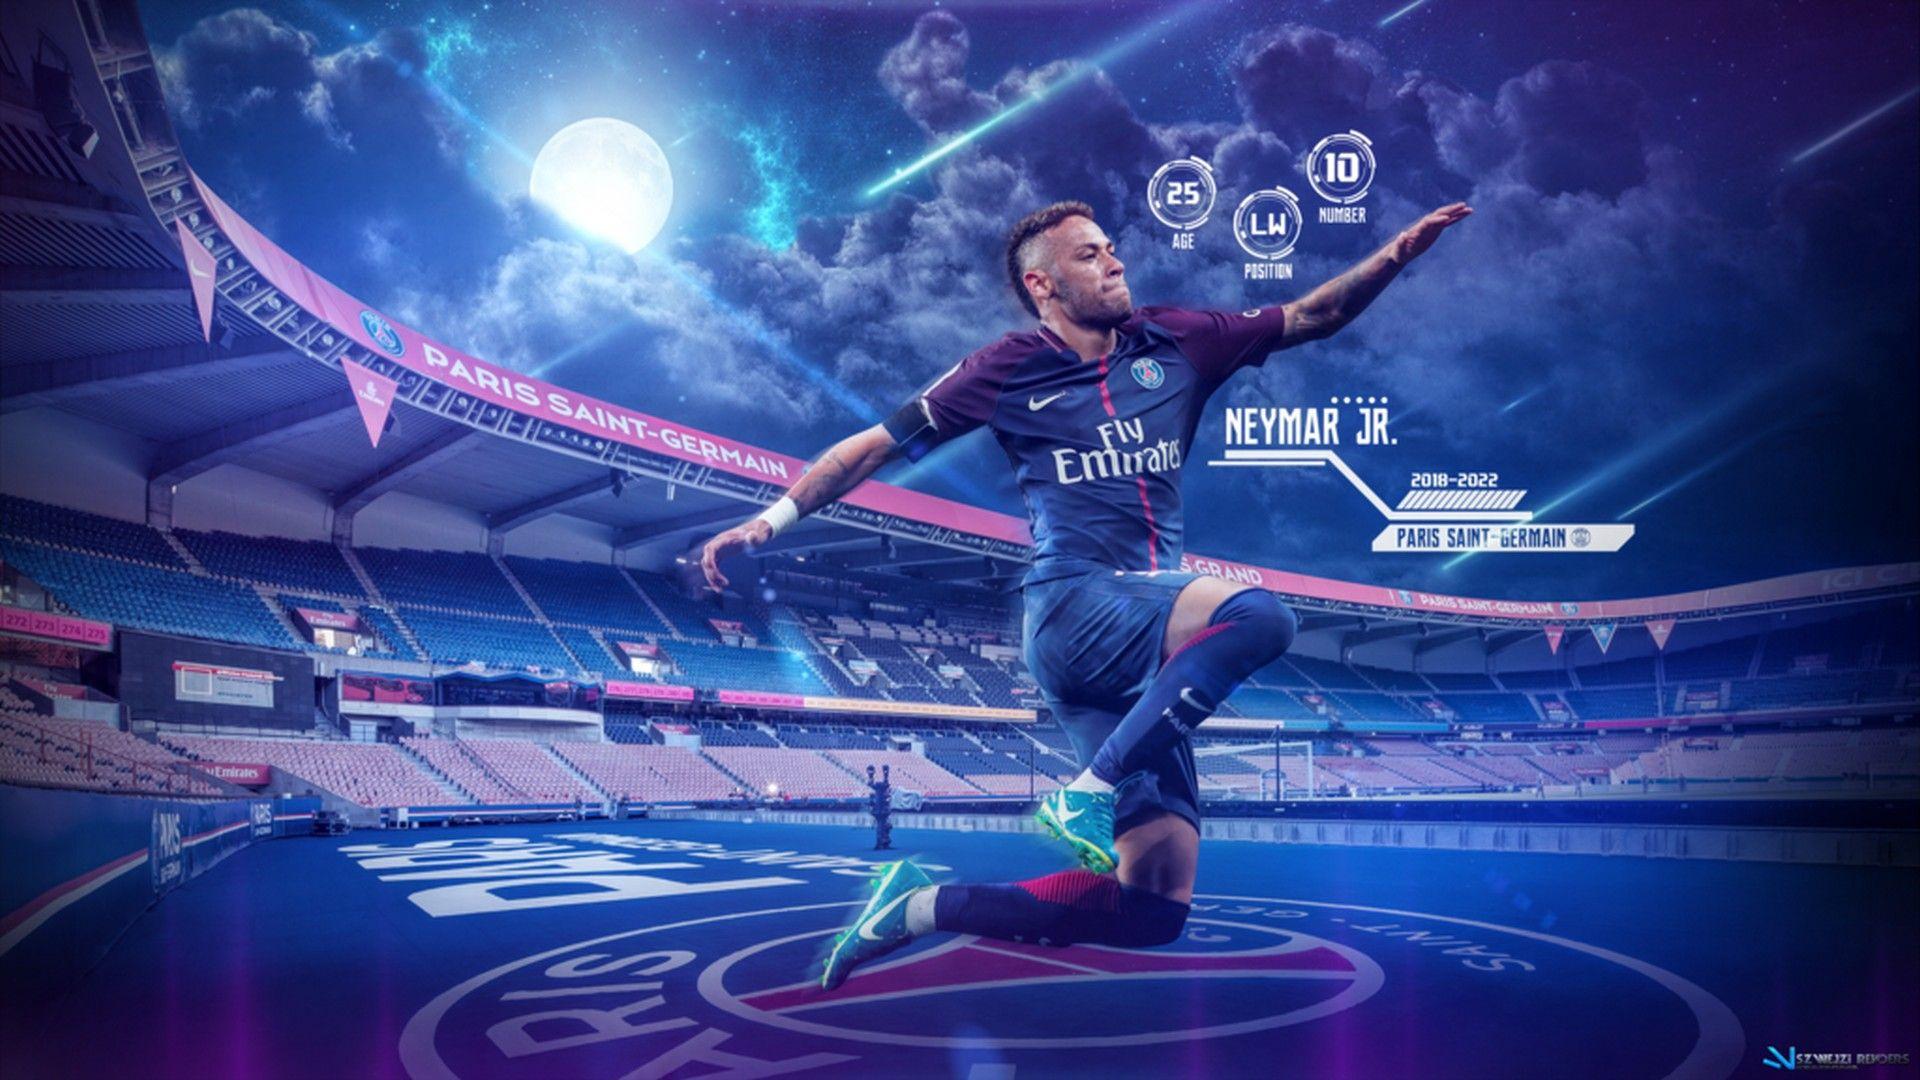 neymar psg hd wallpaper 2021 live